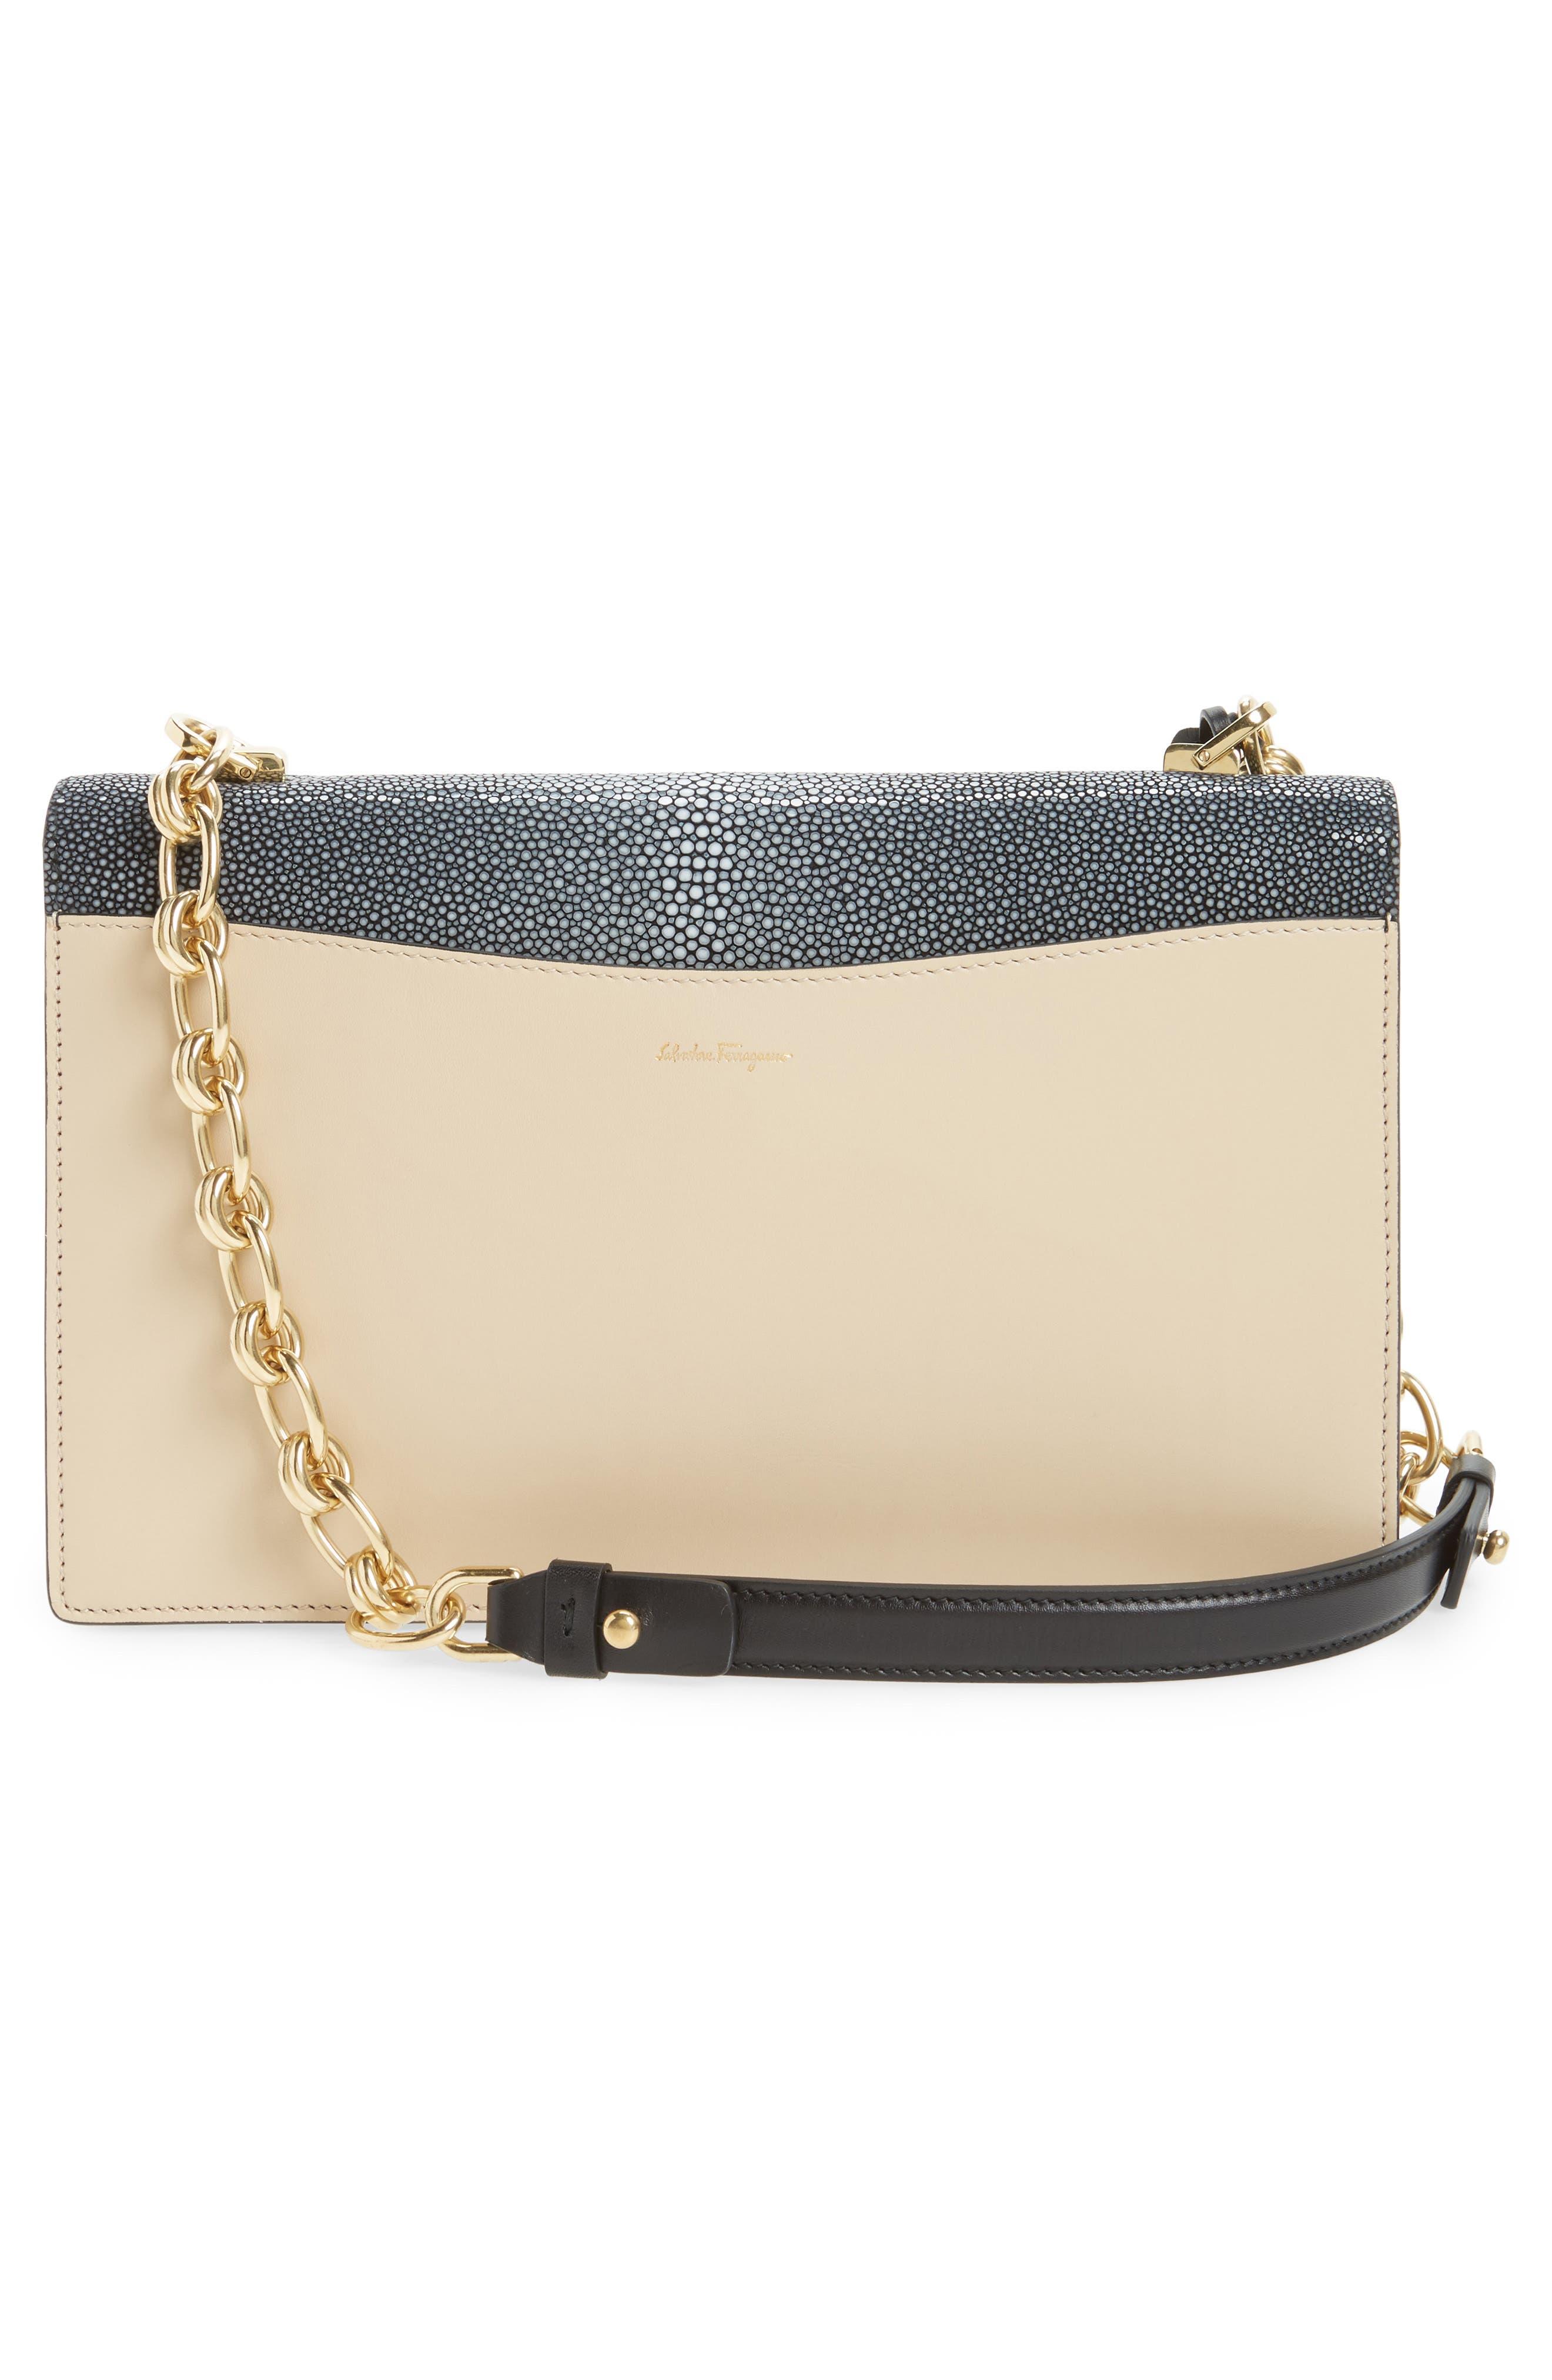 SALVATORE FERRAGAMO,                             Stingray Leather Shoulder Bag,                             Alternate thumbnail 3, color,                             974